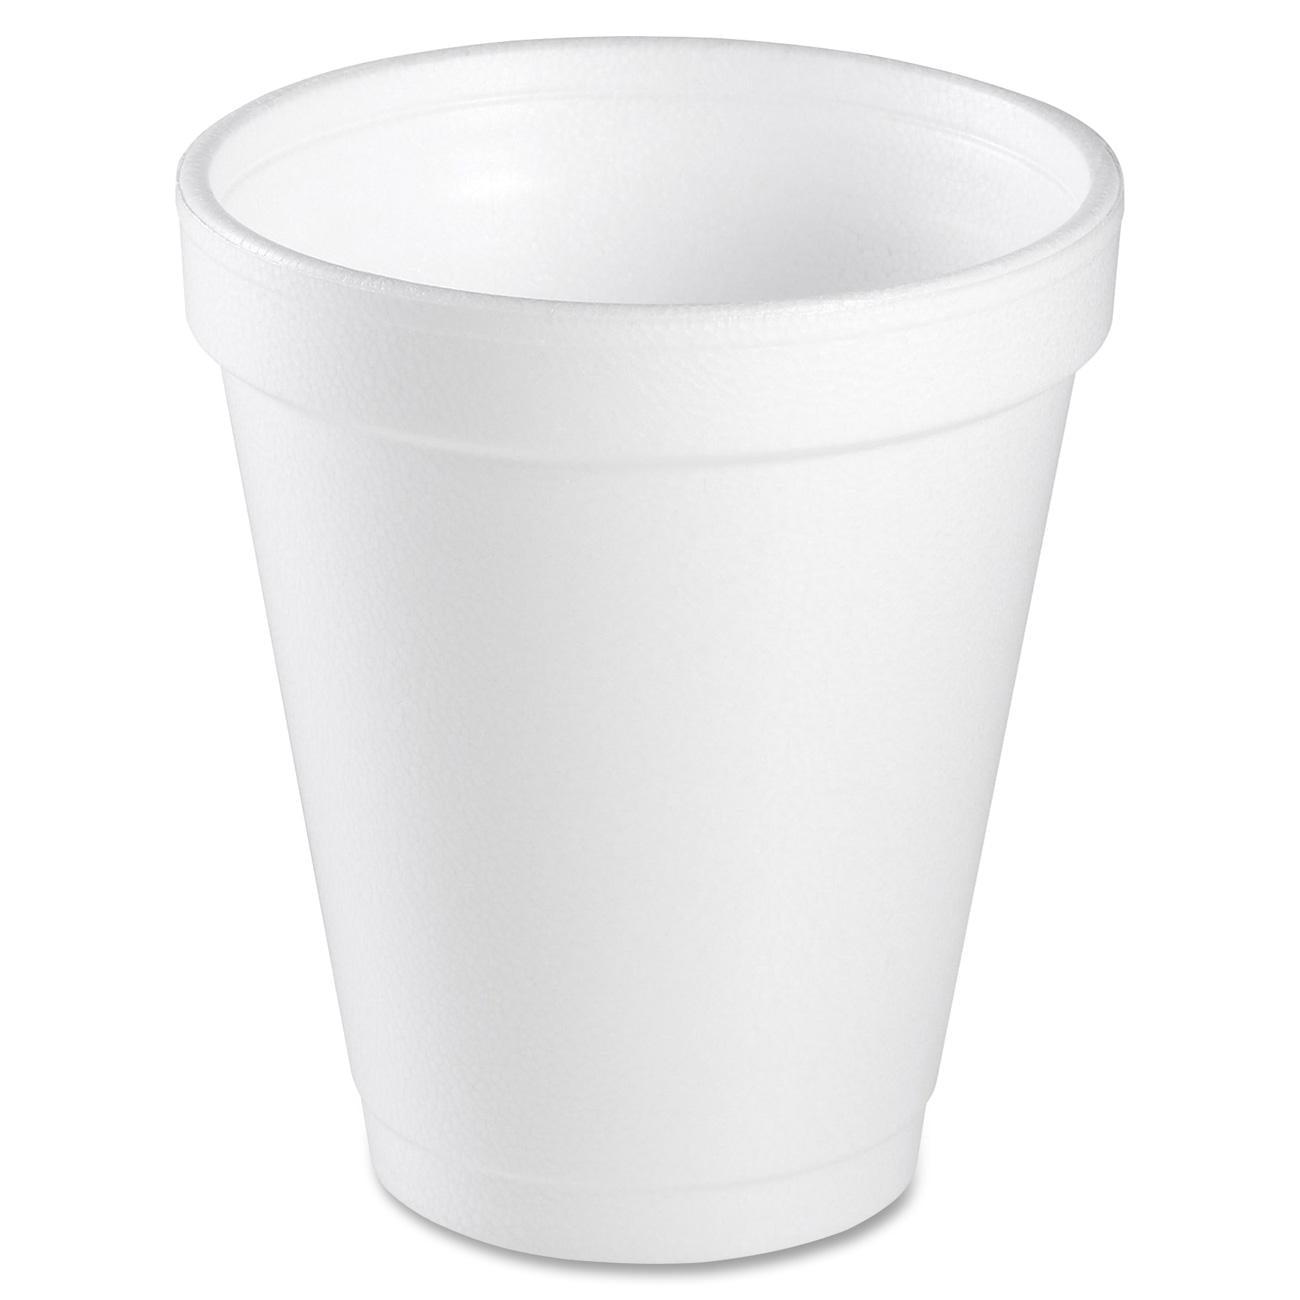 Dart Foam Drink Cups, 6oz, White, 25/Bag, 40 Bags/Carton